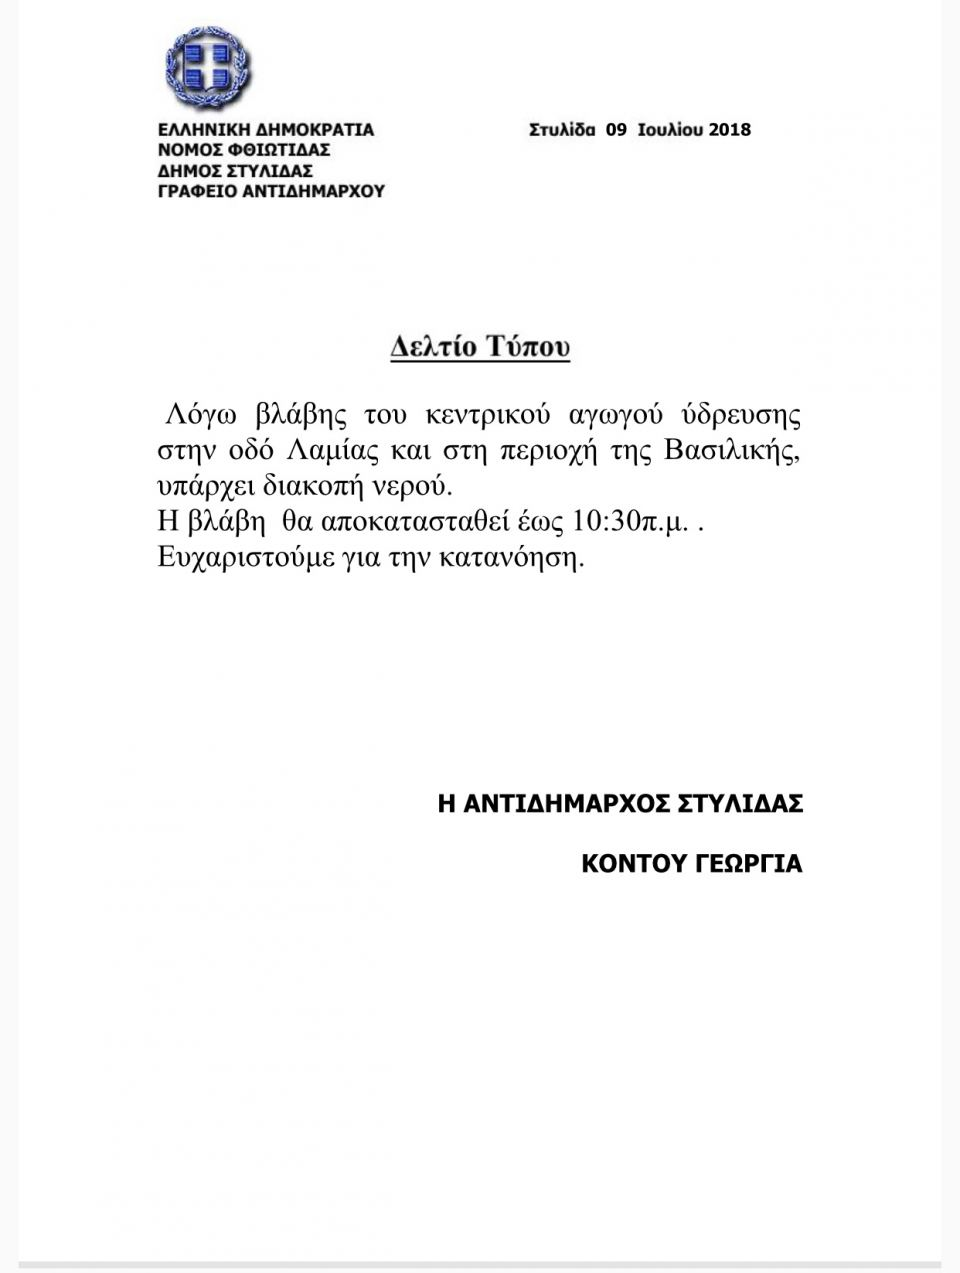 img 7465 1 ΔΙΑΚΟΠΗ ΝΕΡΟΥ